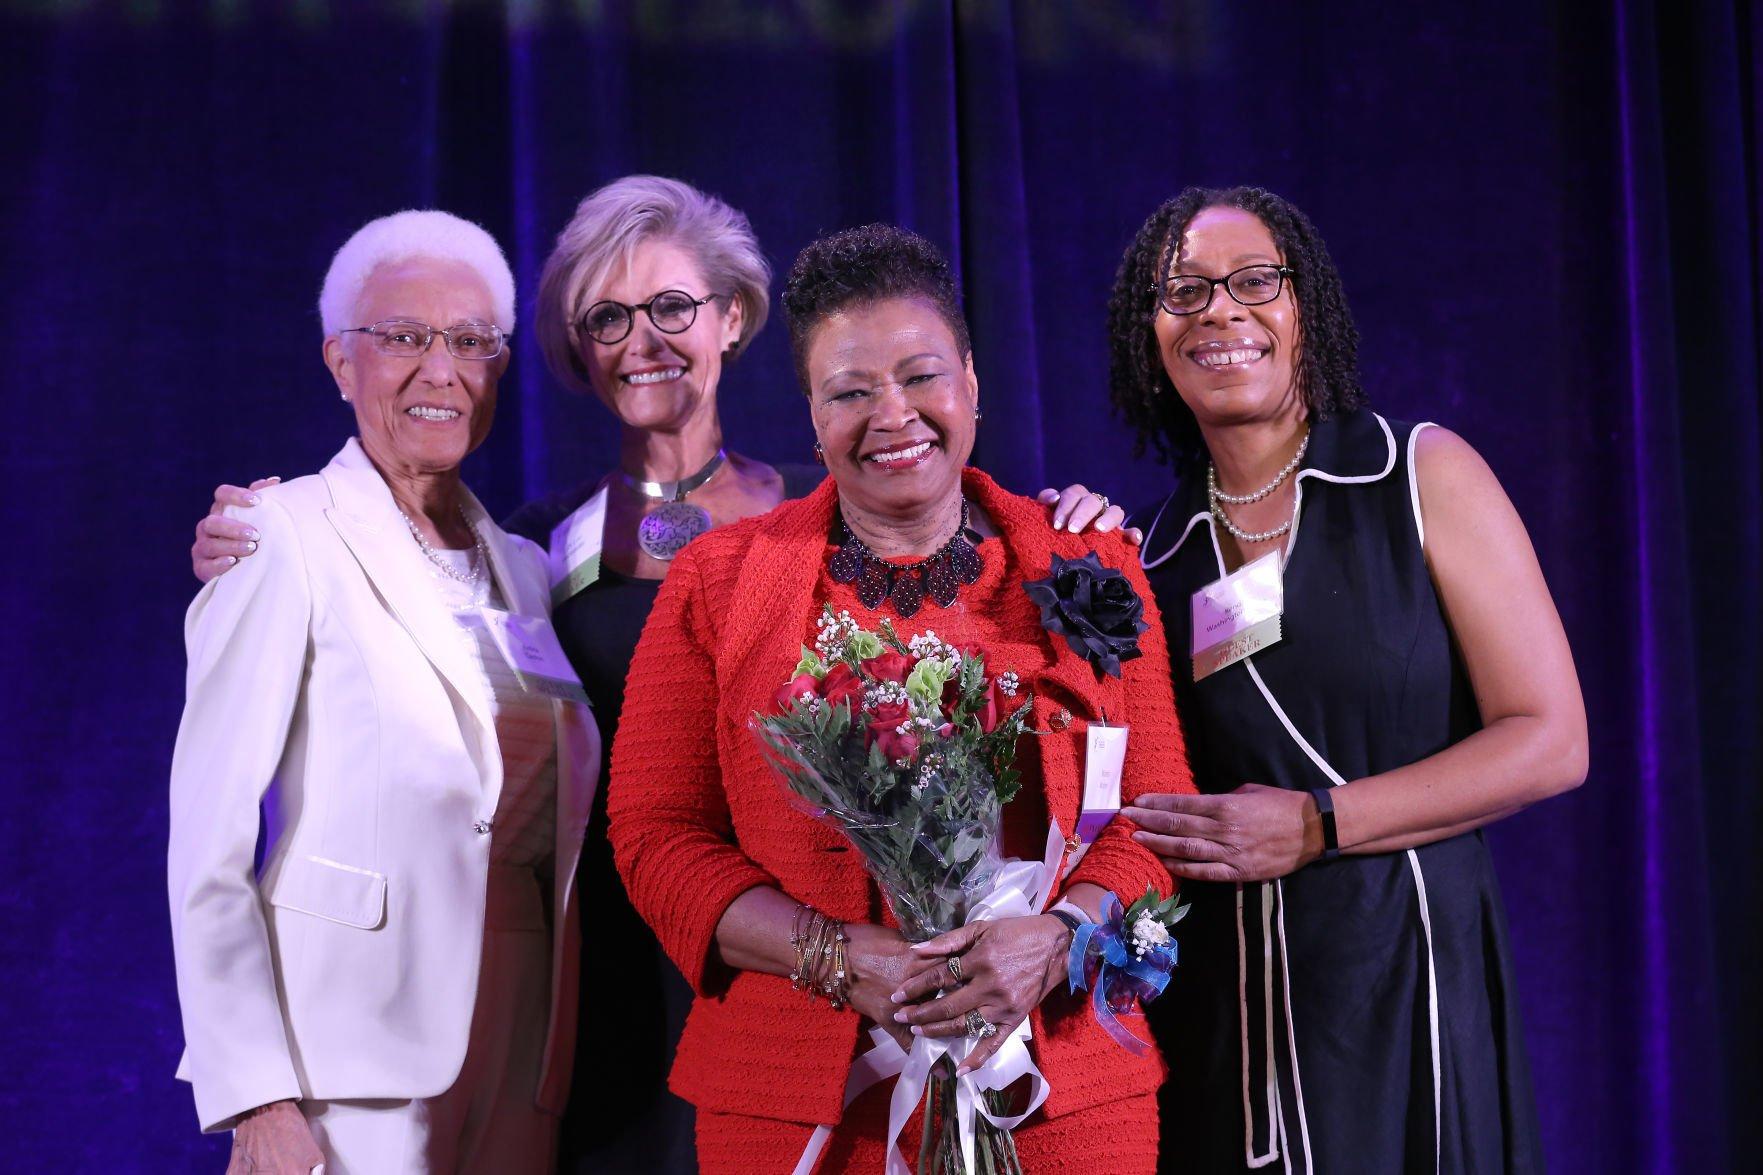 Women's Foundation raises over $700,000 for women and girls | Inside Tucson Business